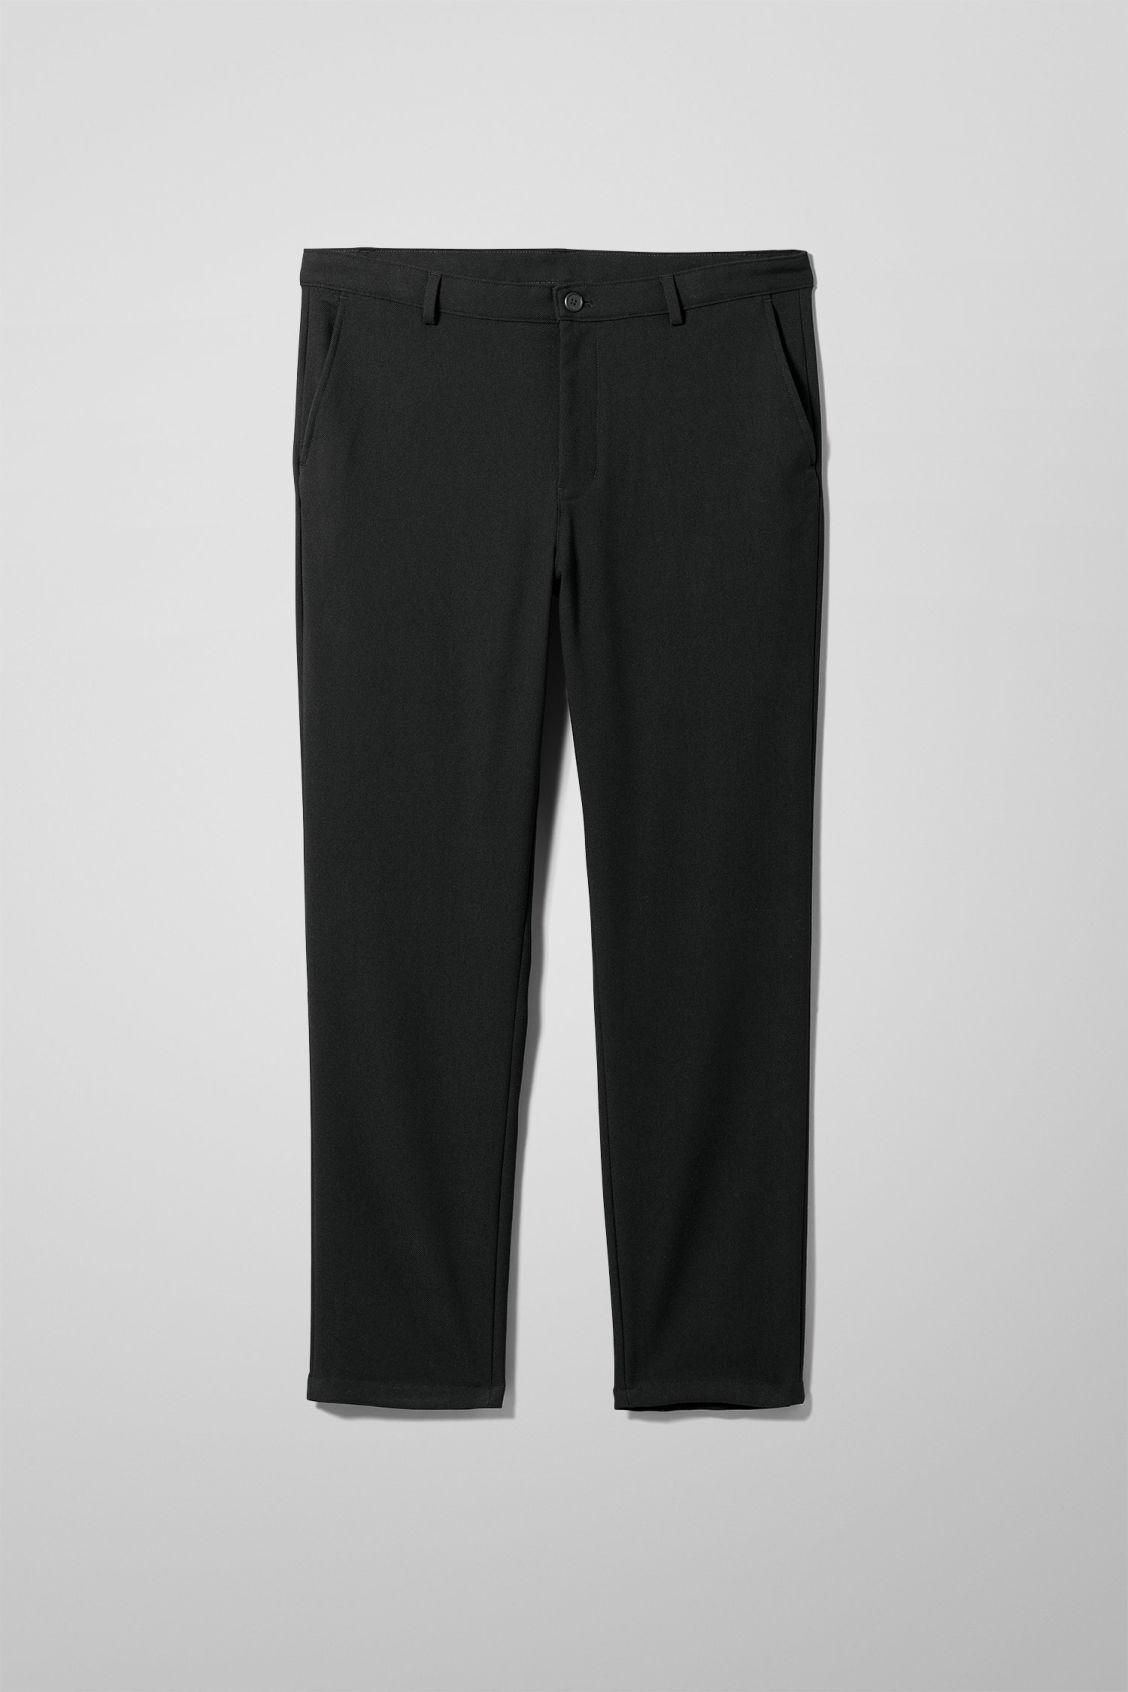 Doyle Trousers - Black